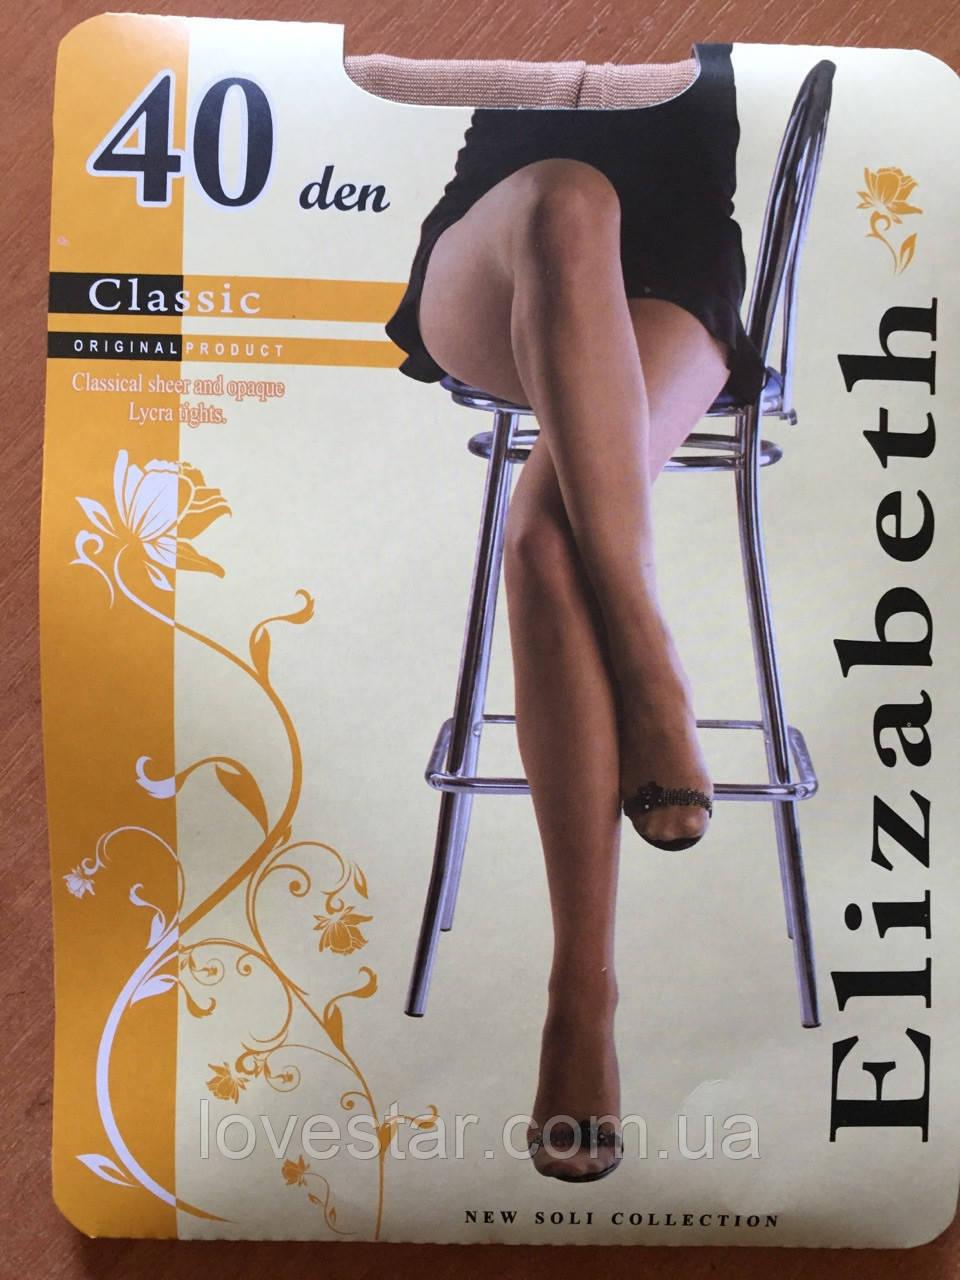 Колготки Elizabeth 40 den classic  5 беж